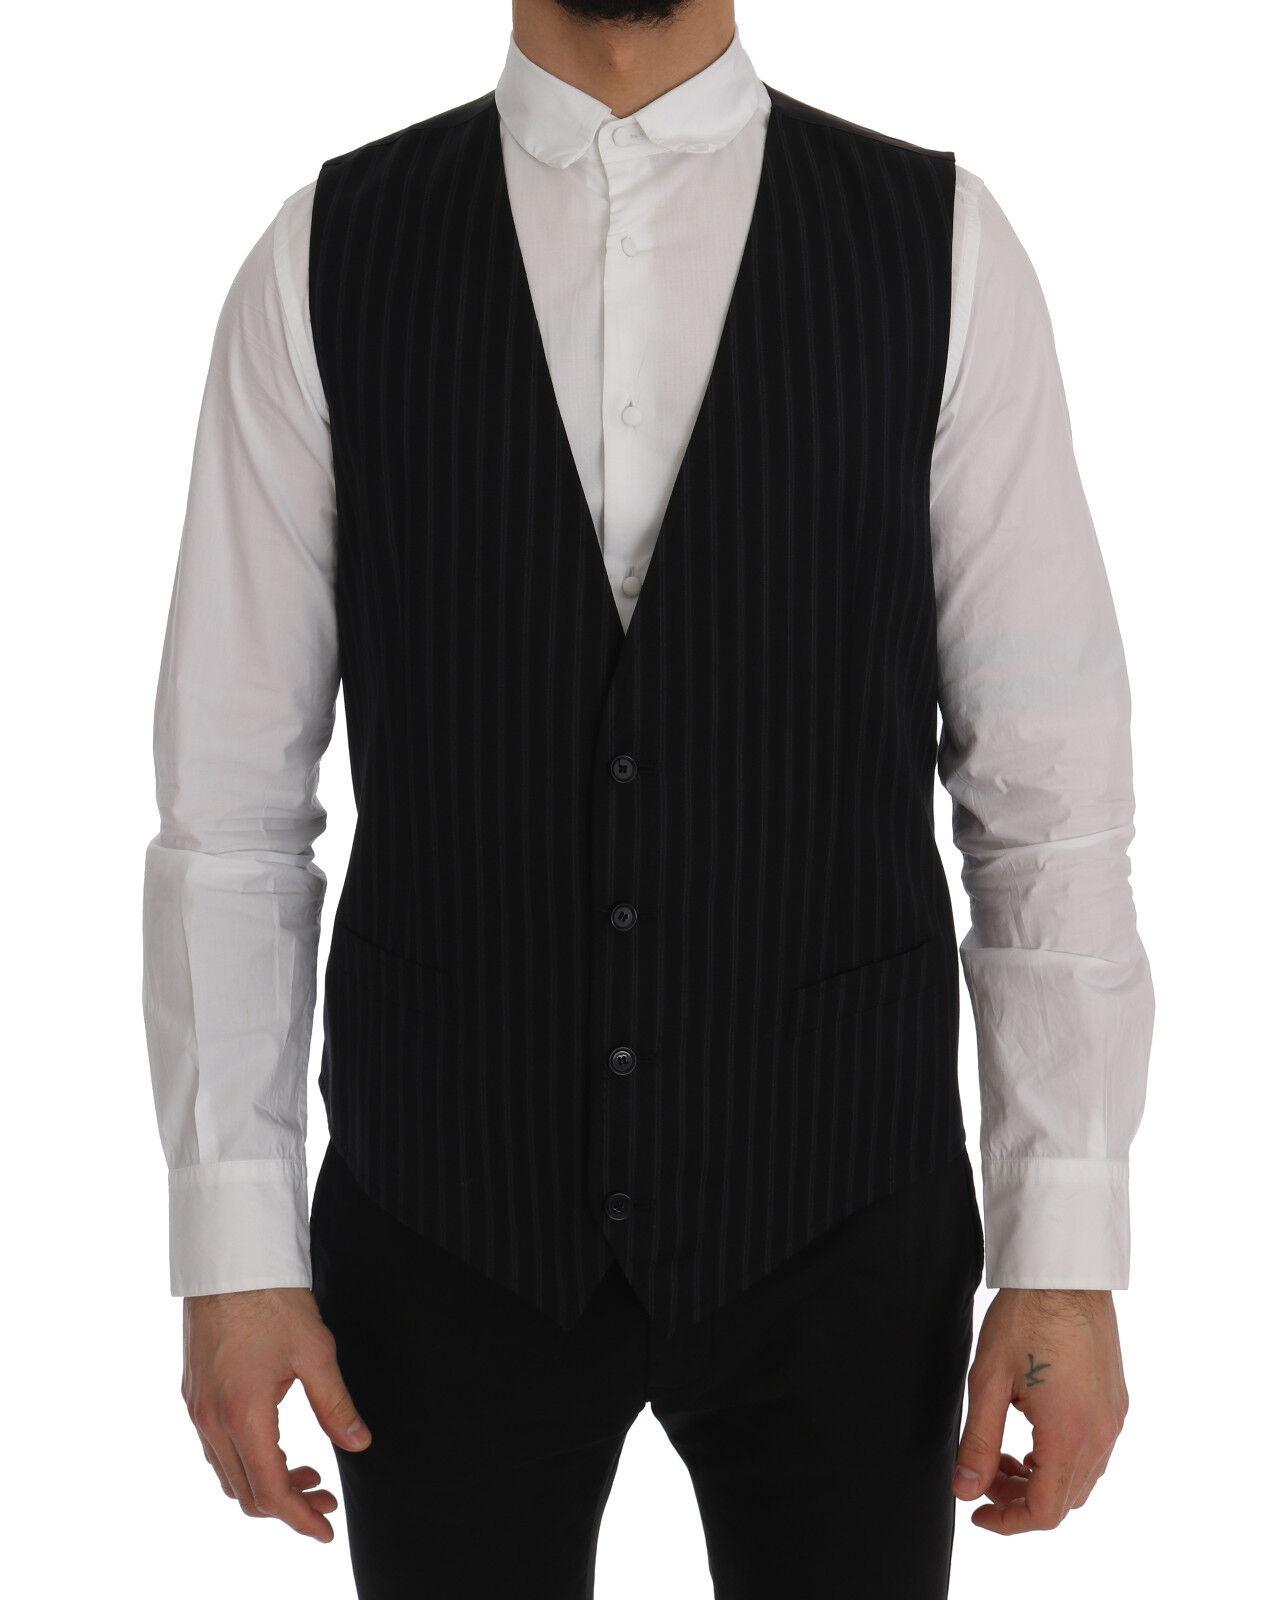 Nuevo Dolce & Gabbana Personal Chaleco Lana Farbe Negro Elástico IT52/ US42/ XL